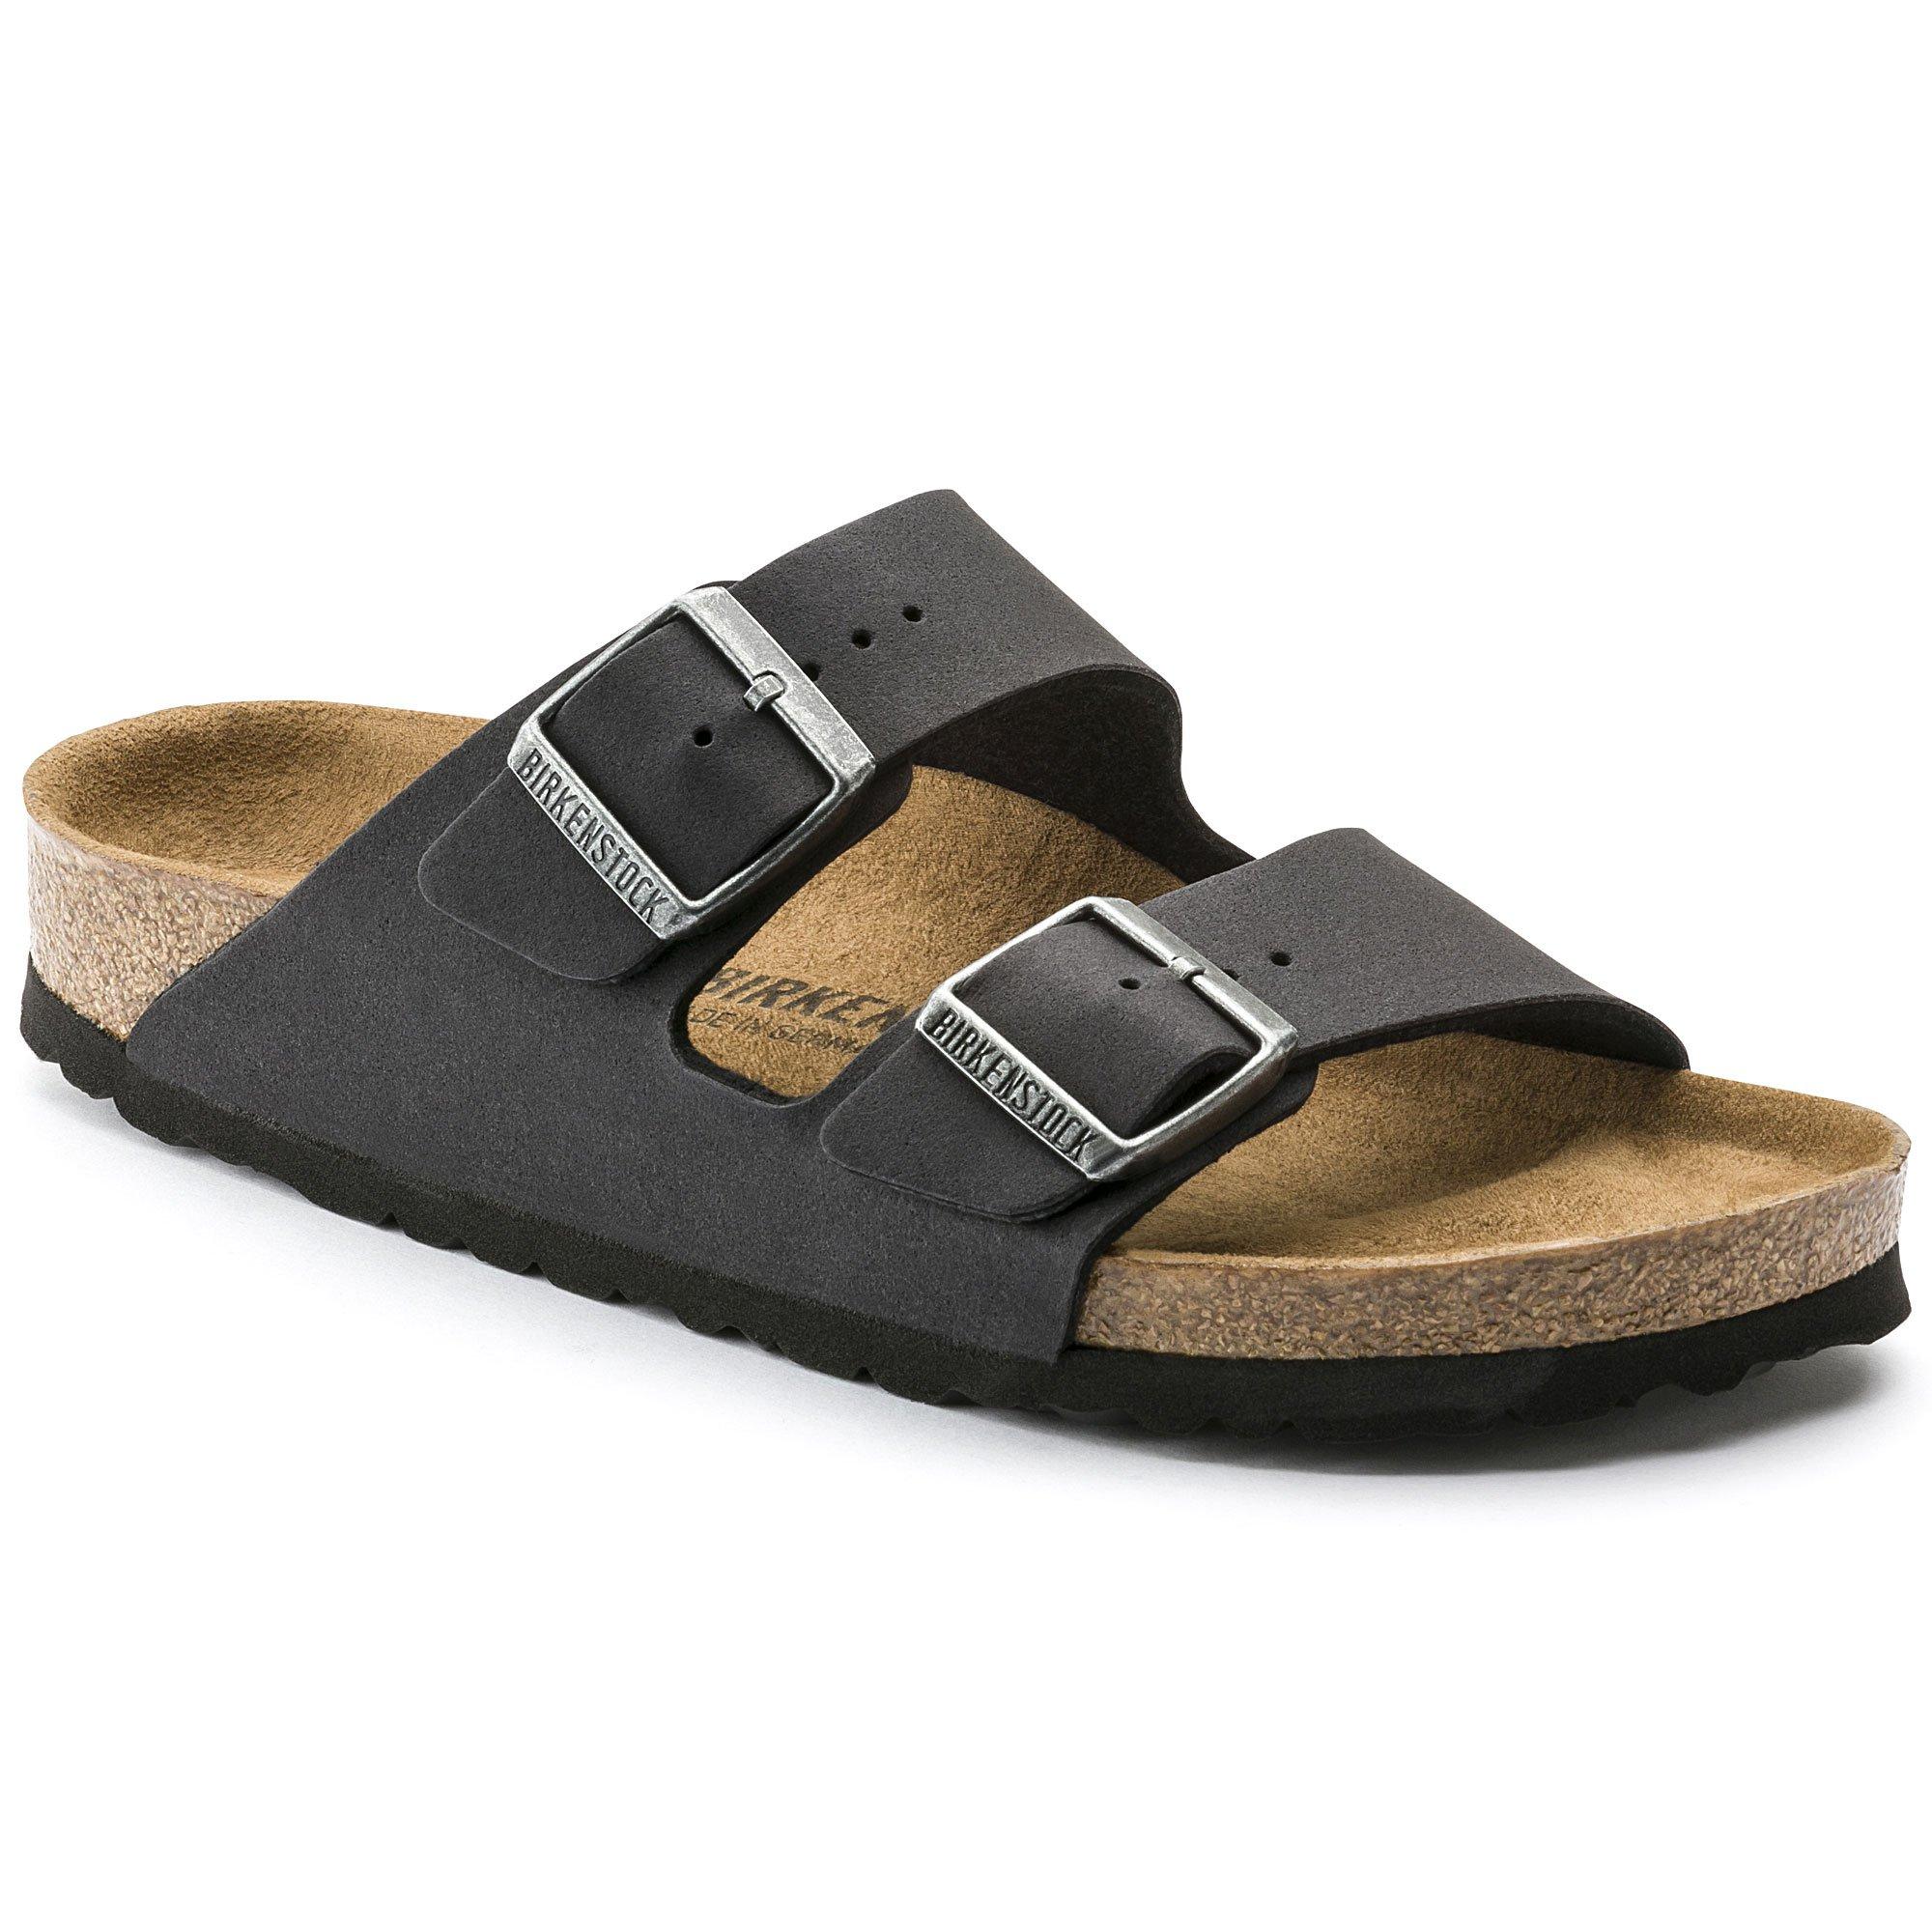 Birkenstock Women's Arizona  Birko-Flo Anthracite Sandals - 44 N EU